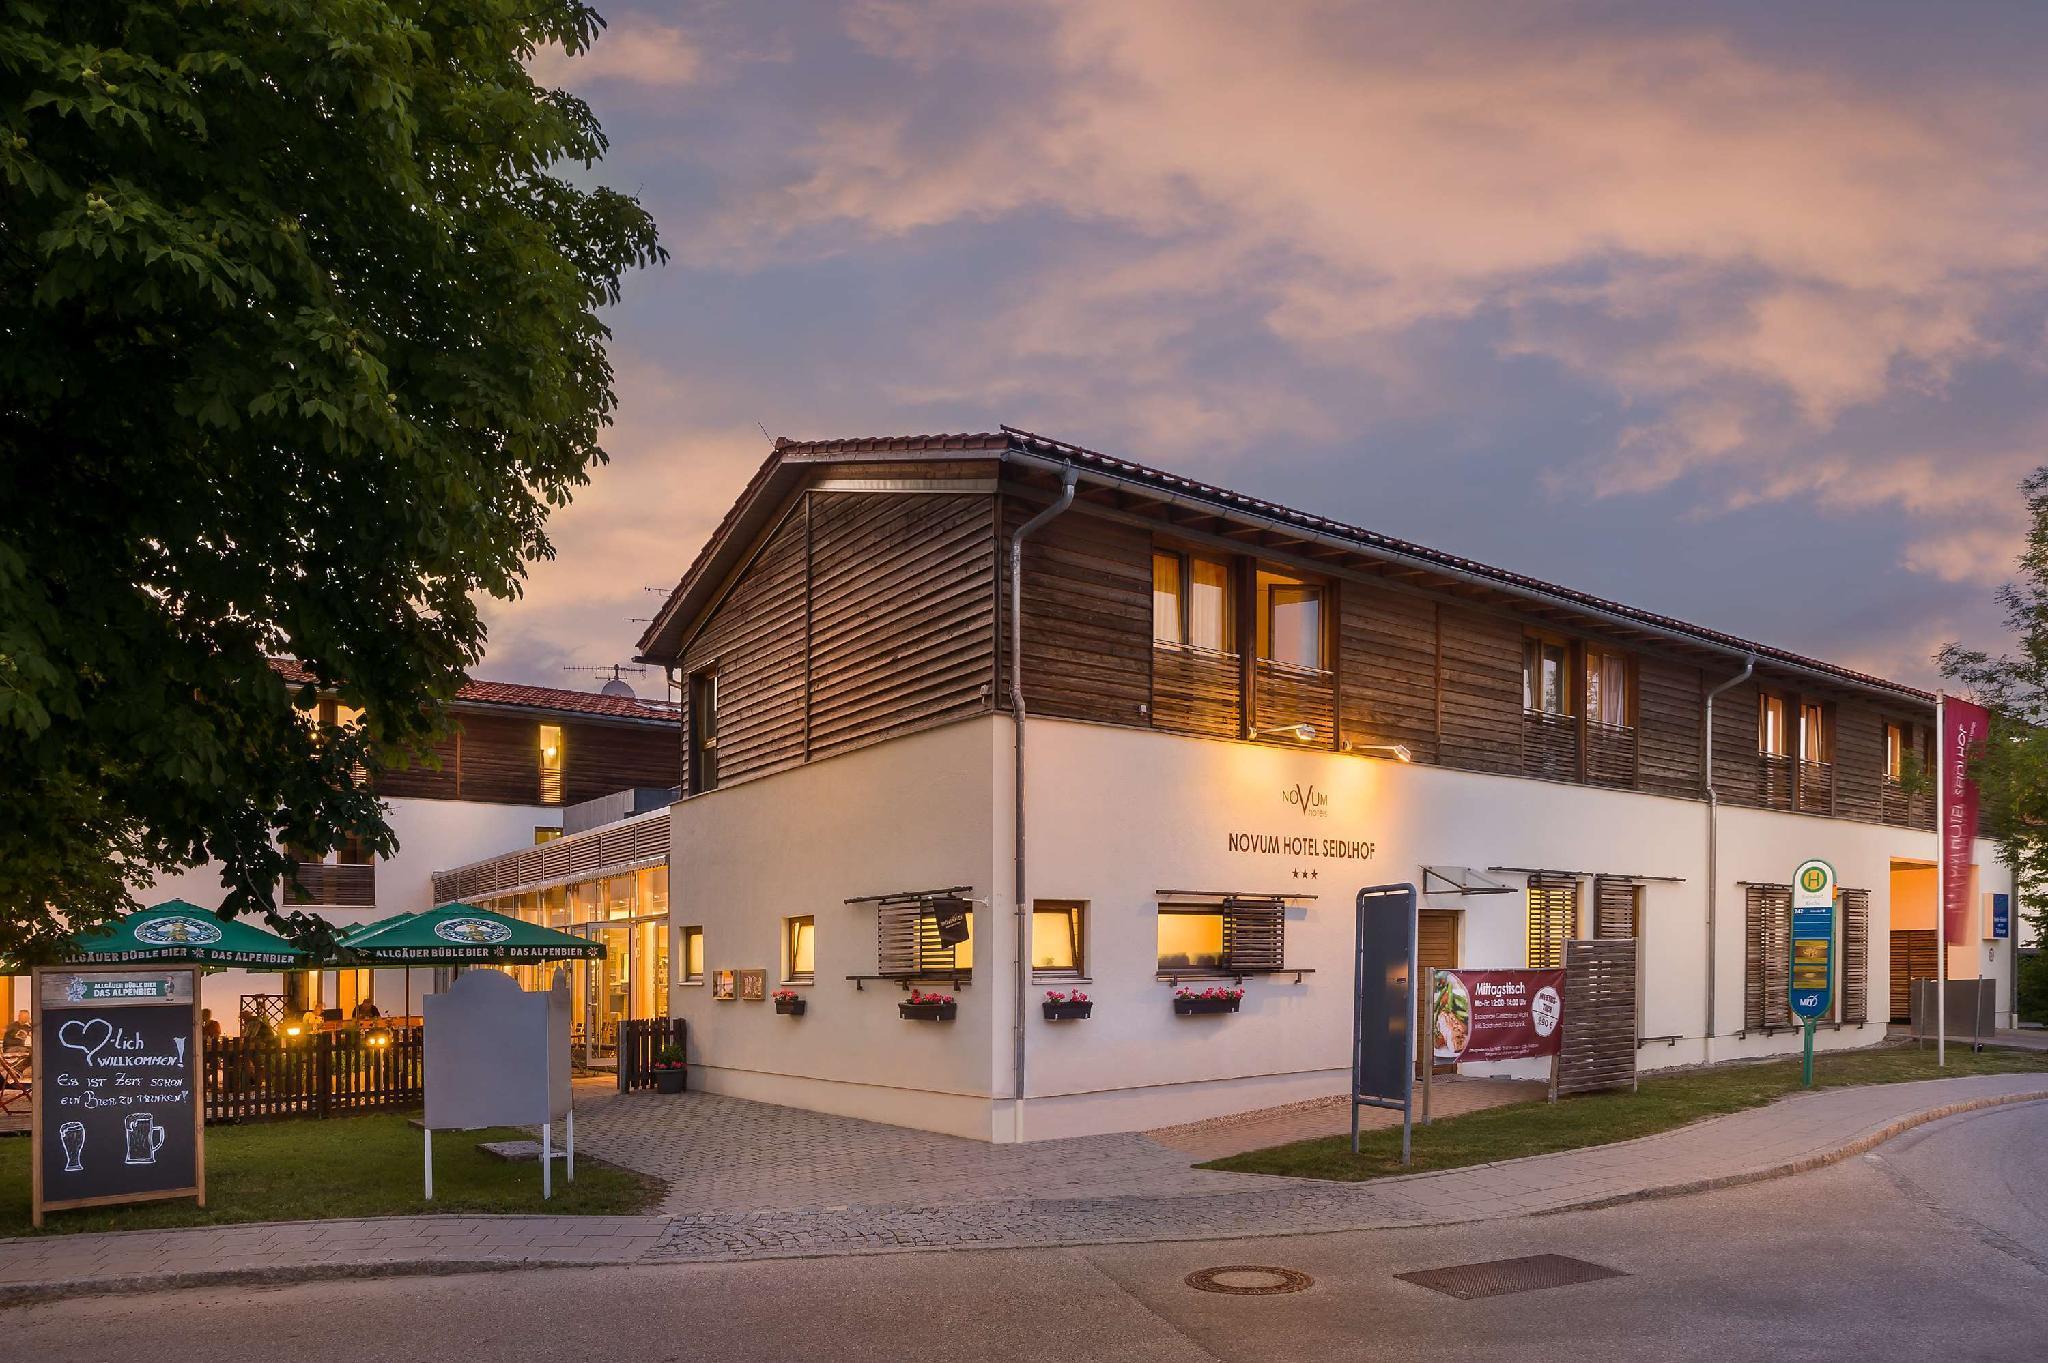 Novum Hotel Seidlhof M�nchen